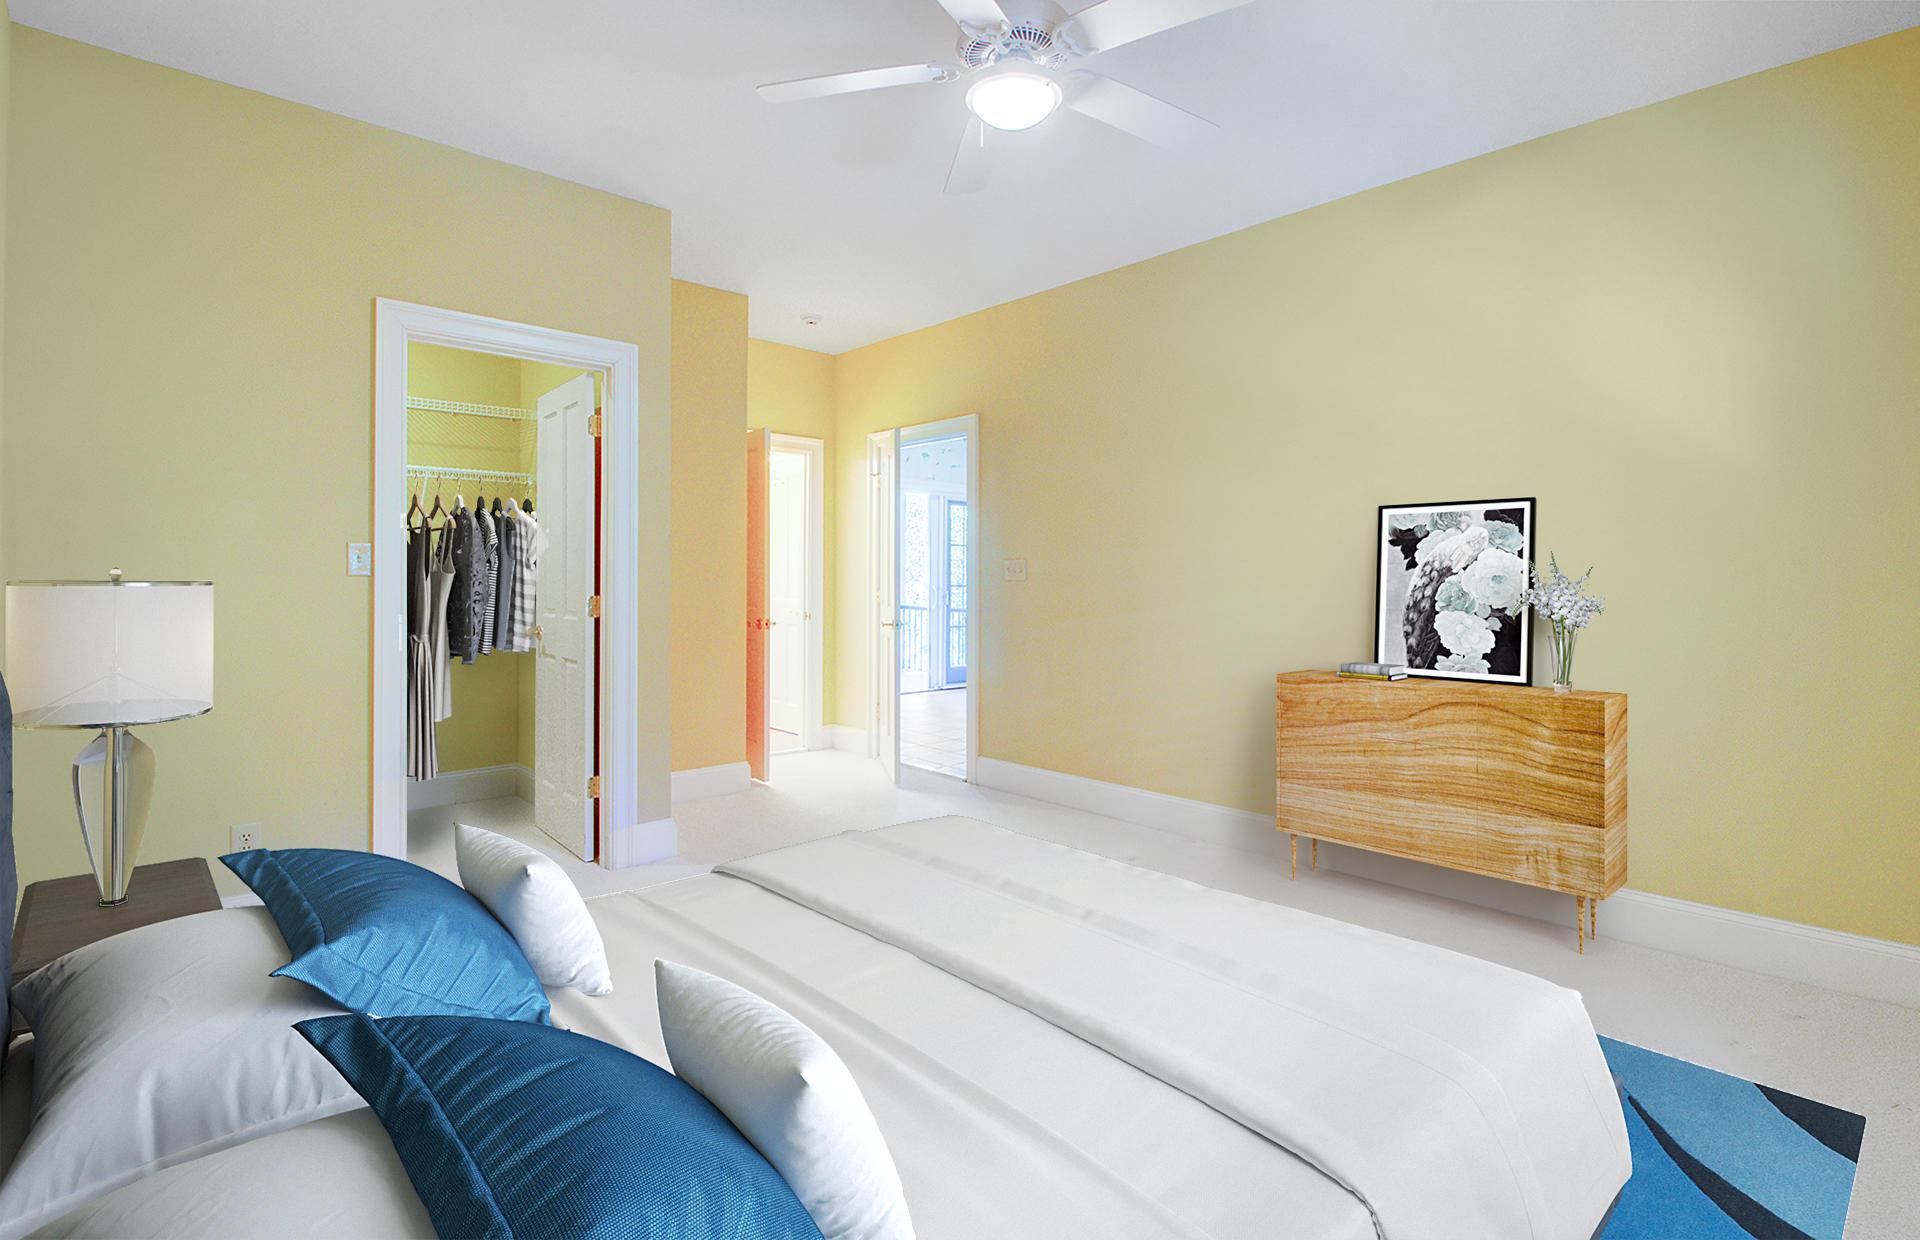 Kiawah Island Homes For Sale - 402 Ocean Oaks, Kiawah Island, SC - 19